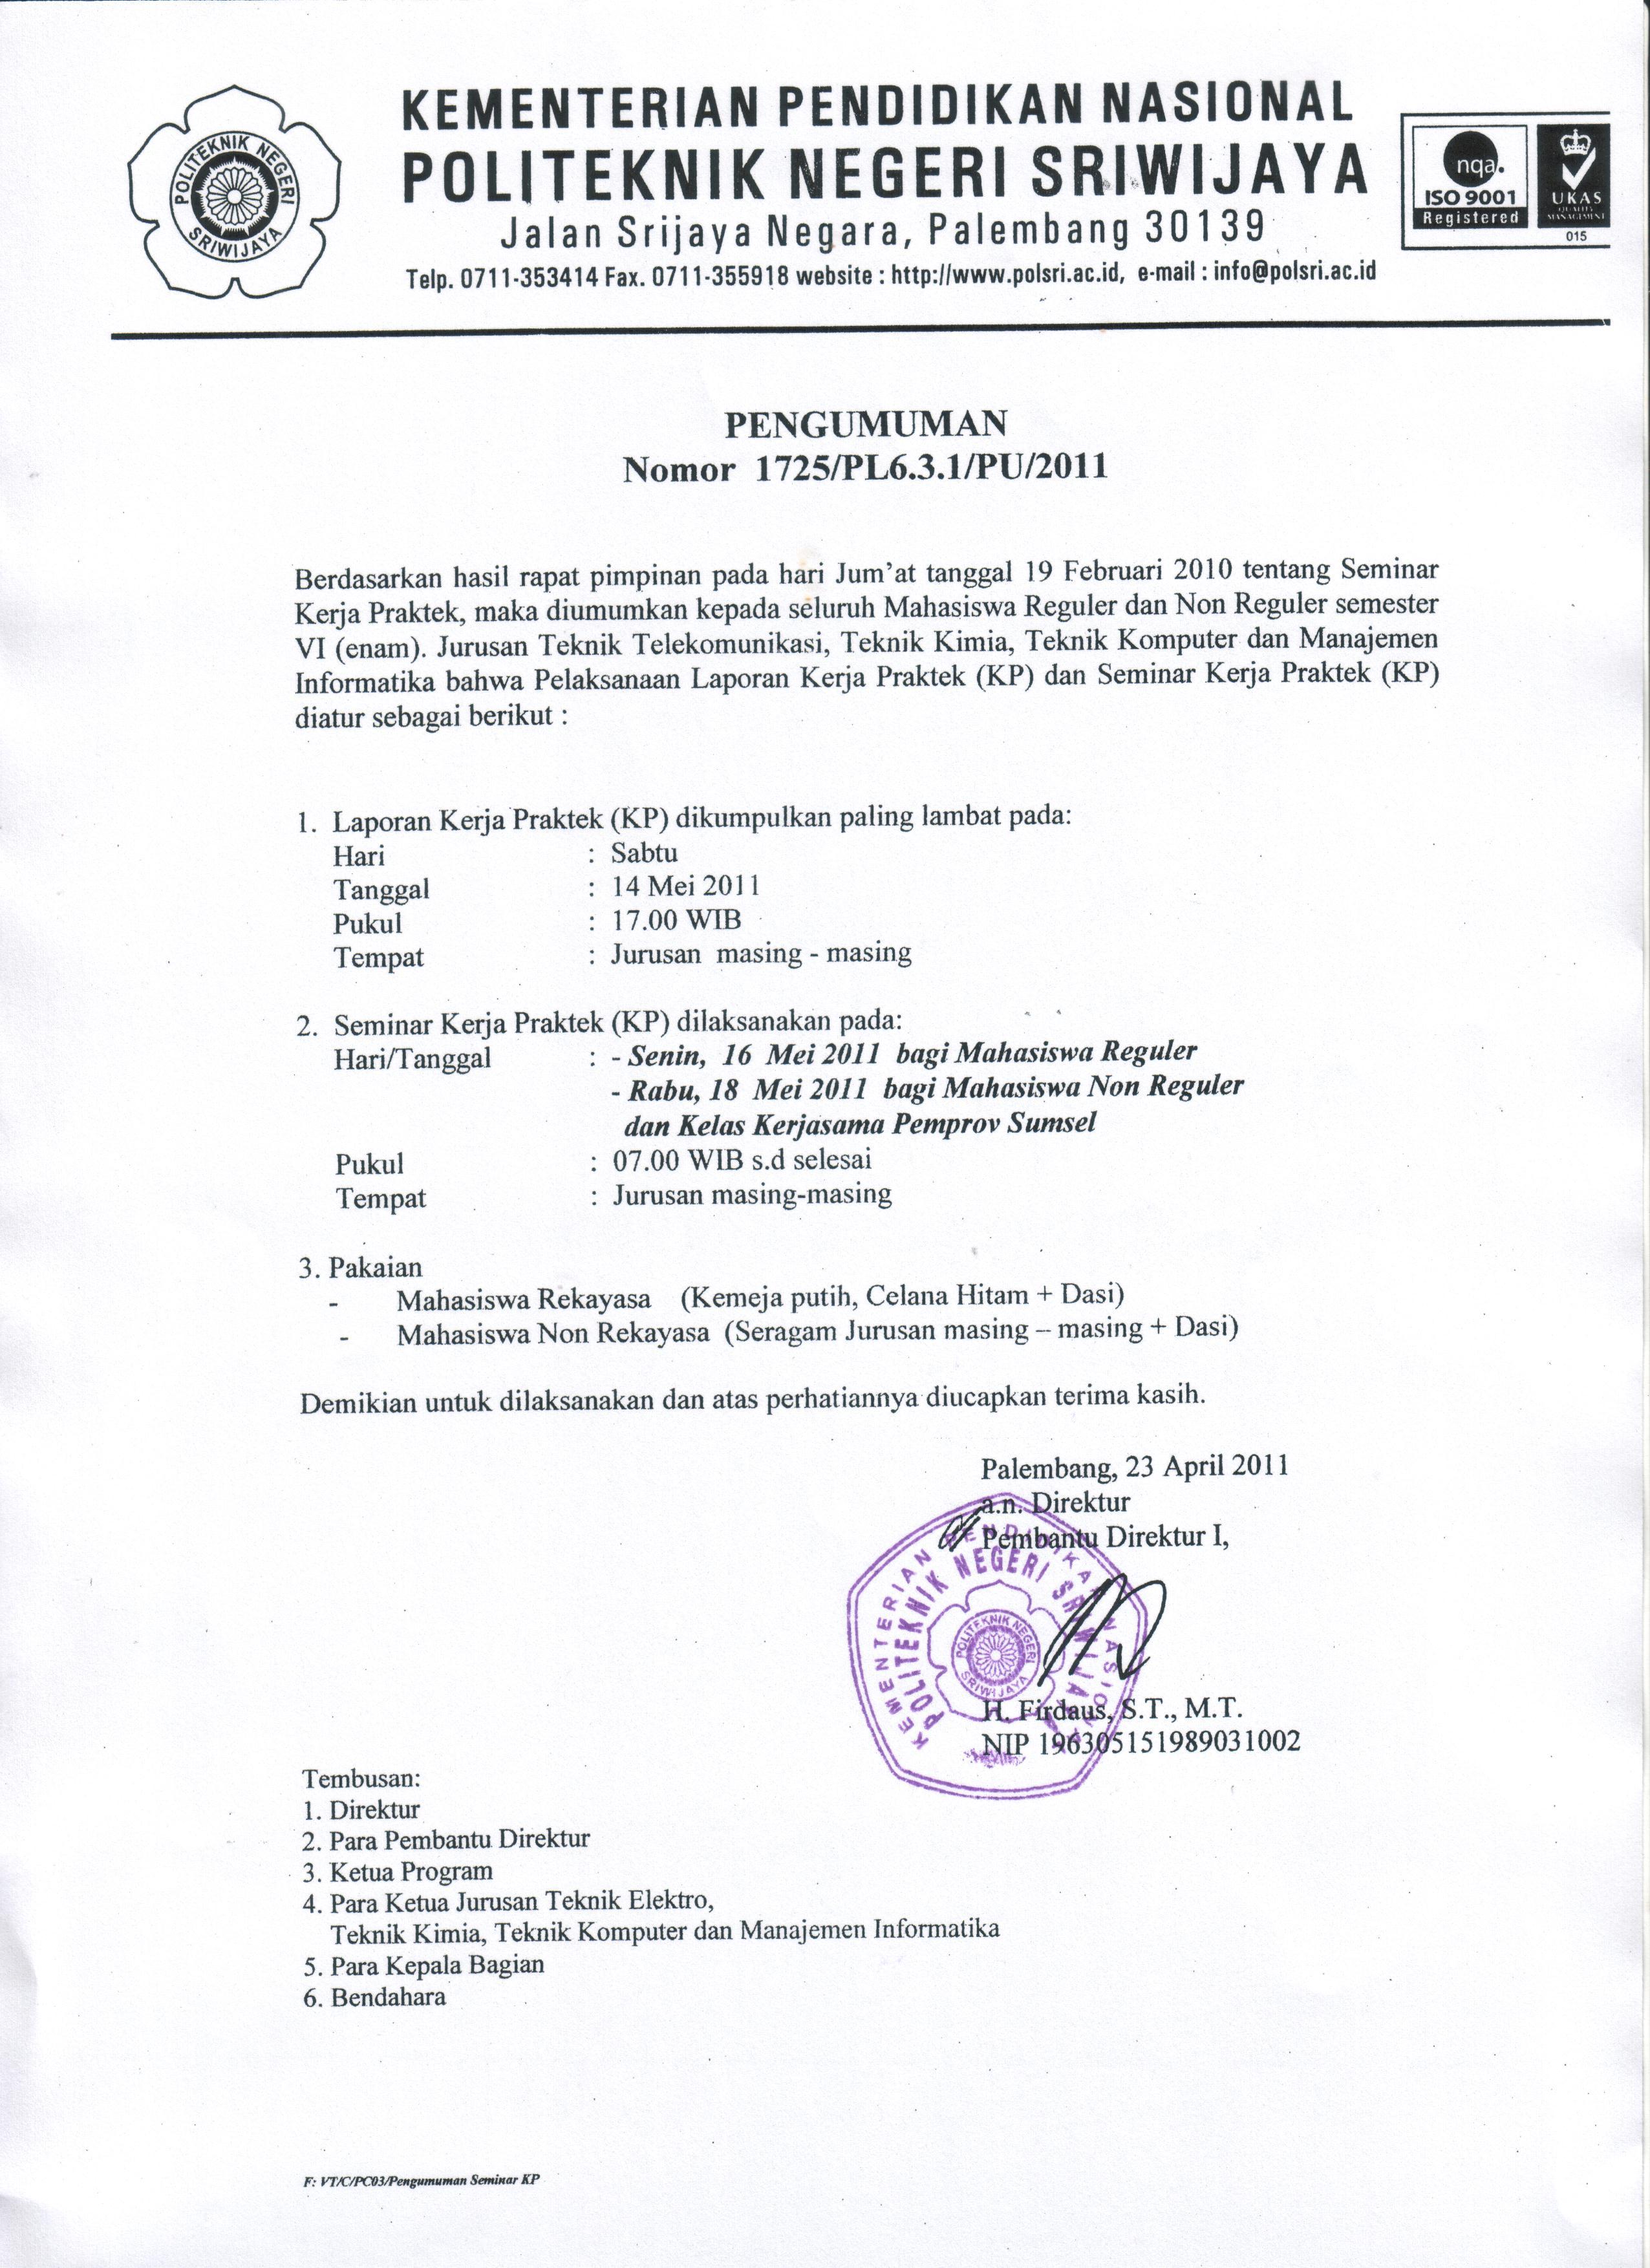 Pengumuman Pelaksanaan Laporan Kerja Praktek (KP) dan